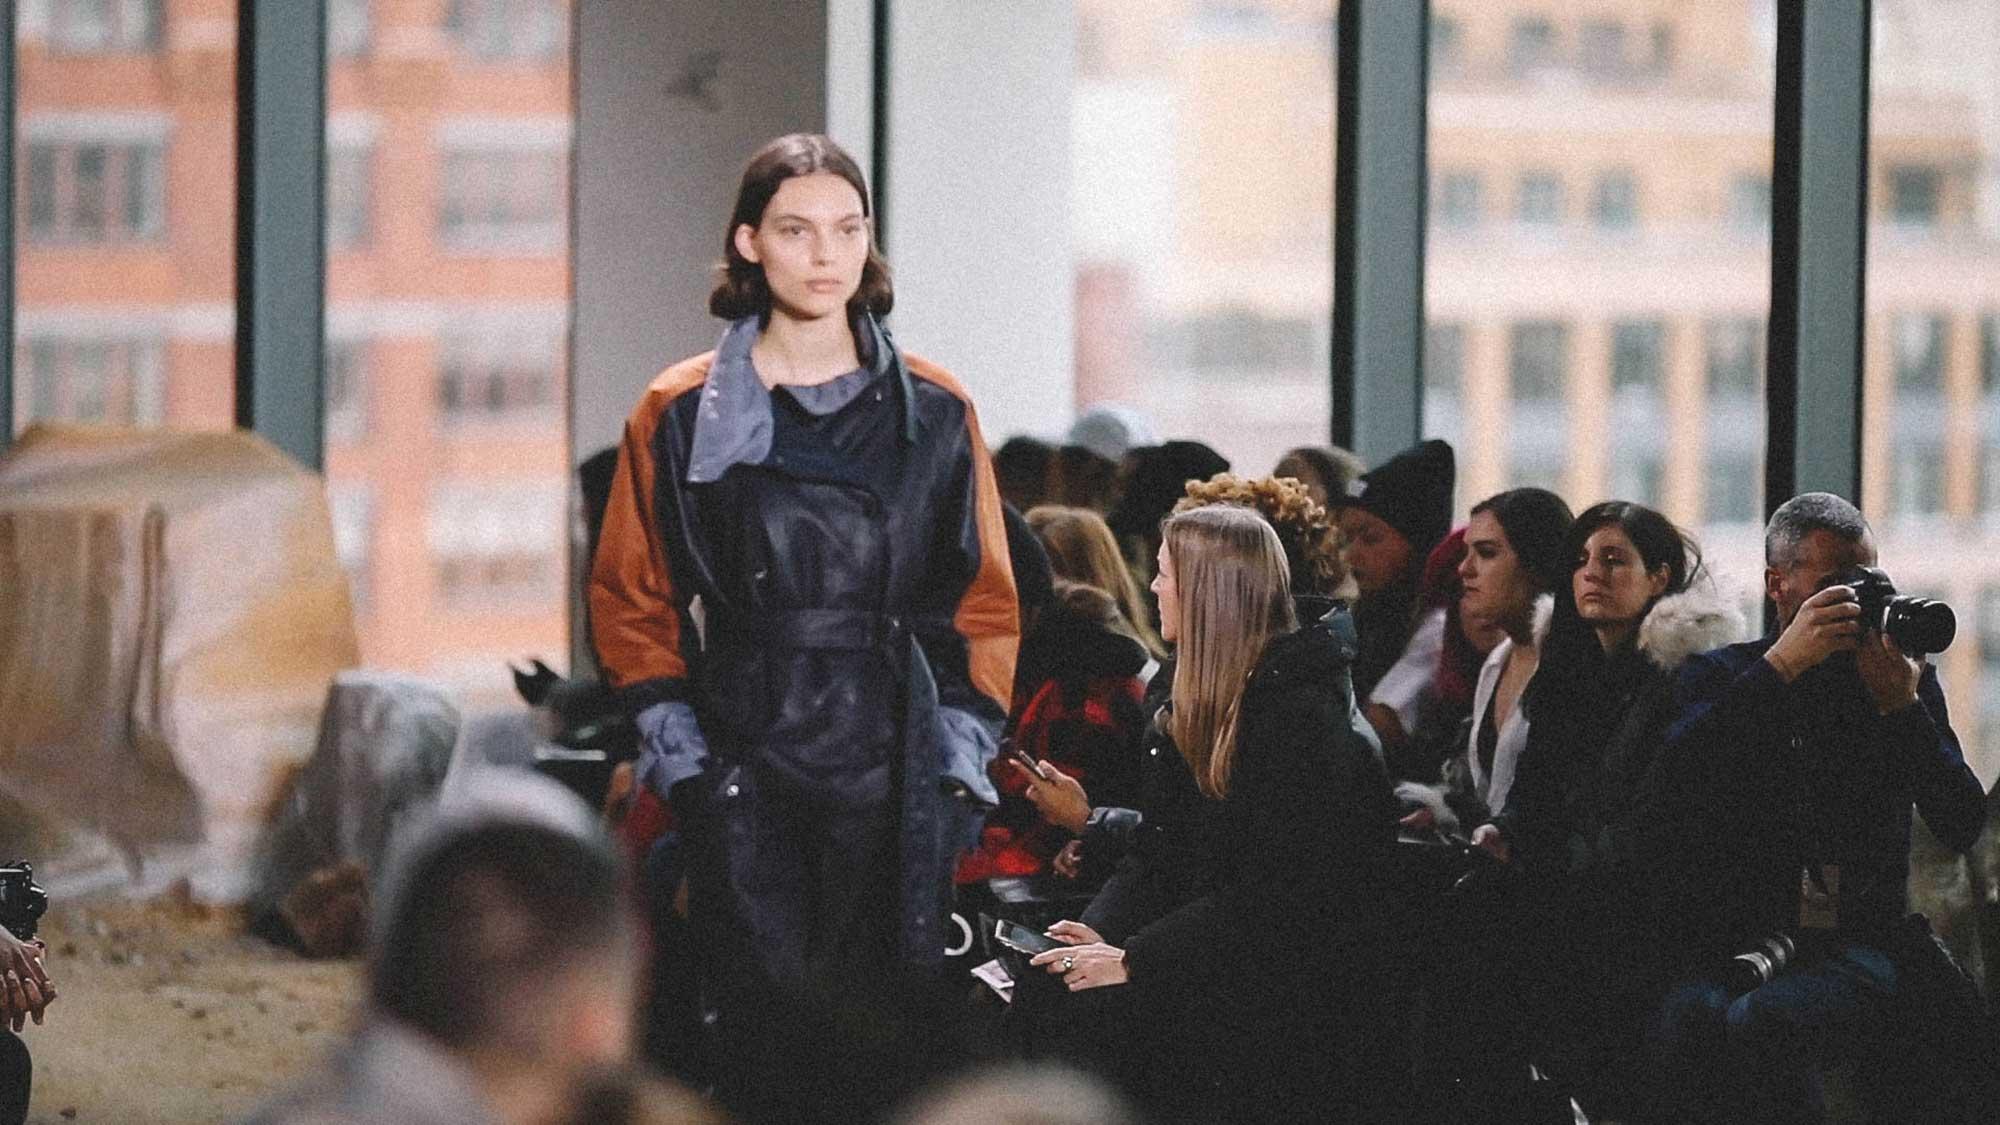 Lacoste-Runway-Show-New-York-Fashion-Week-2.jpg